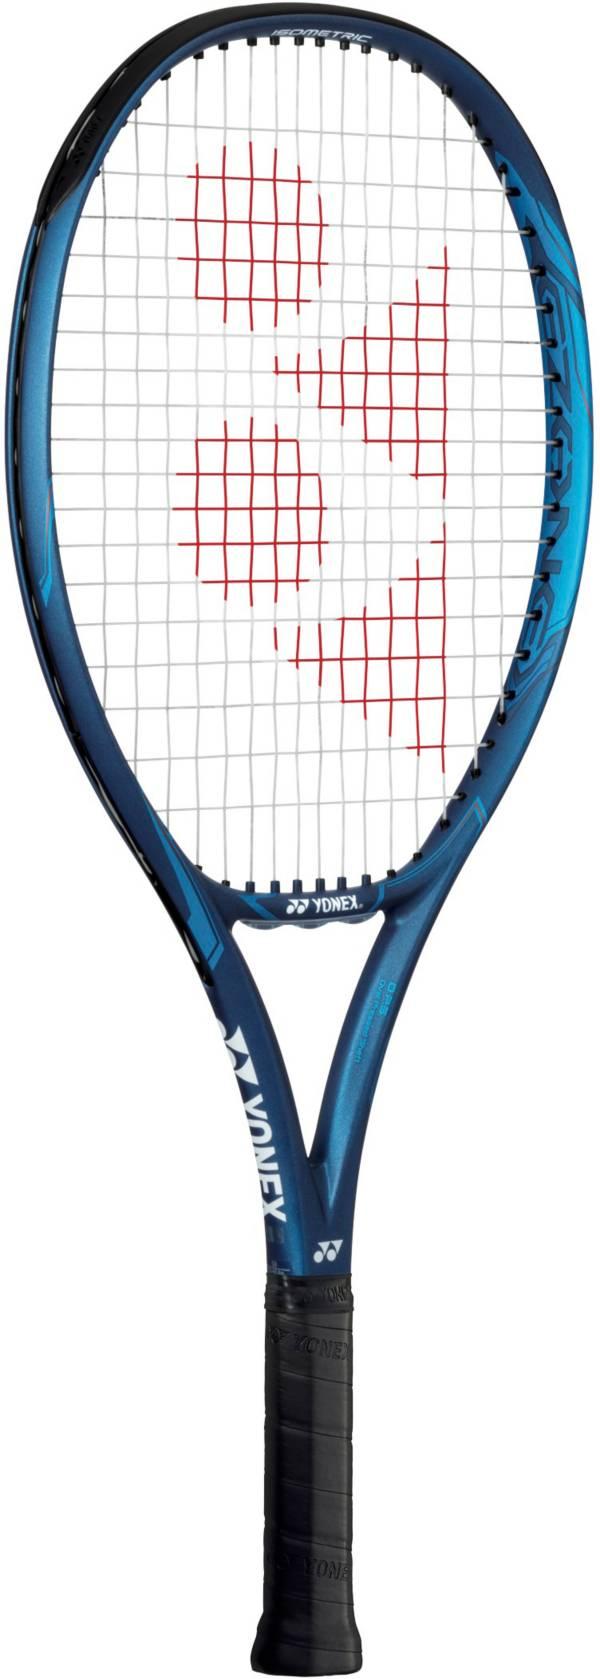 "Yonex EZONE 25"" Junior Tennis Racquet product image"